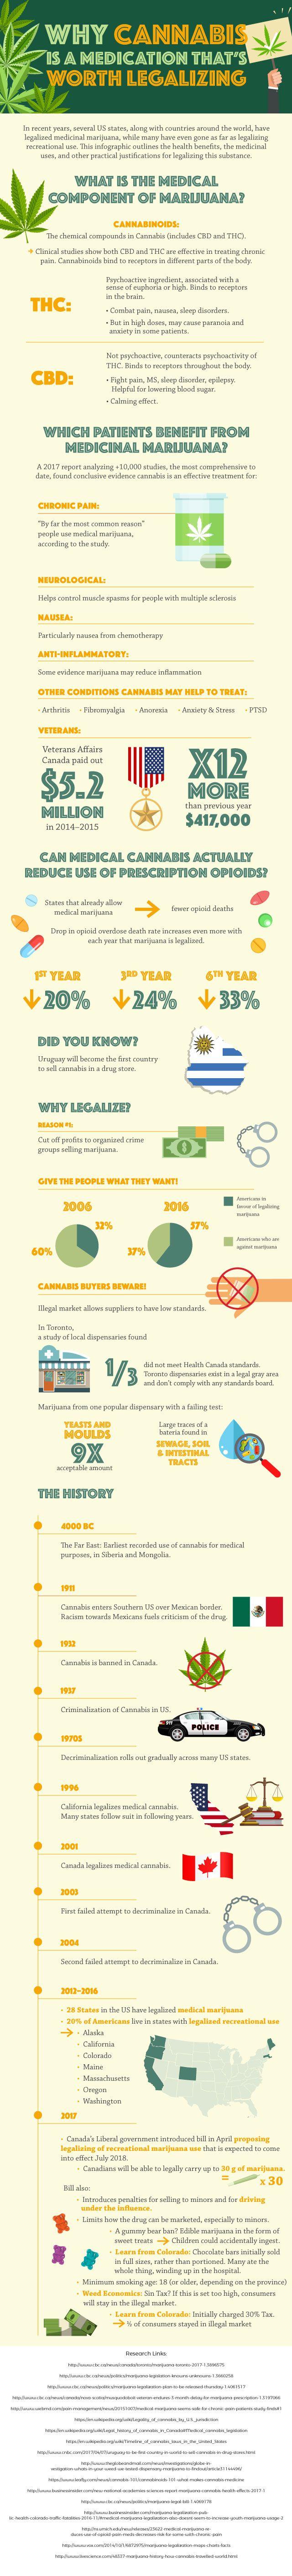 Why Cannabis is a Medication Worth Legalization